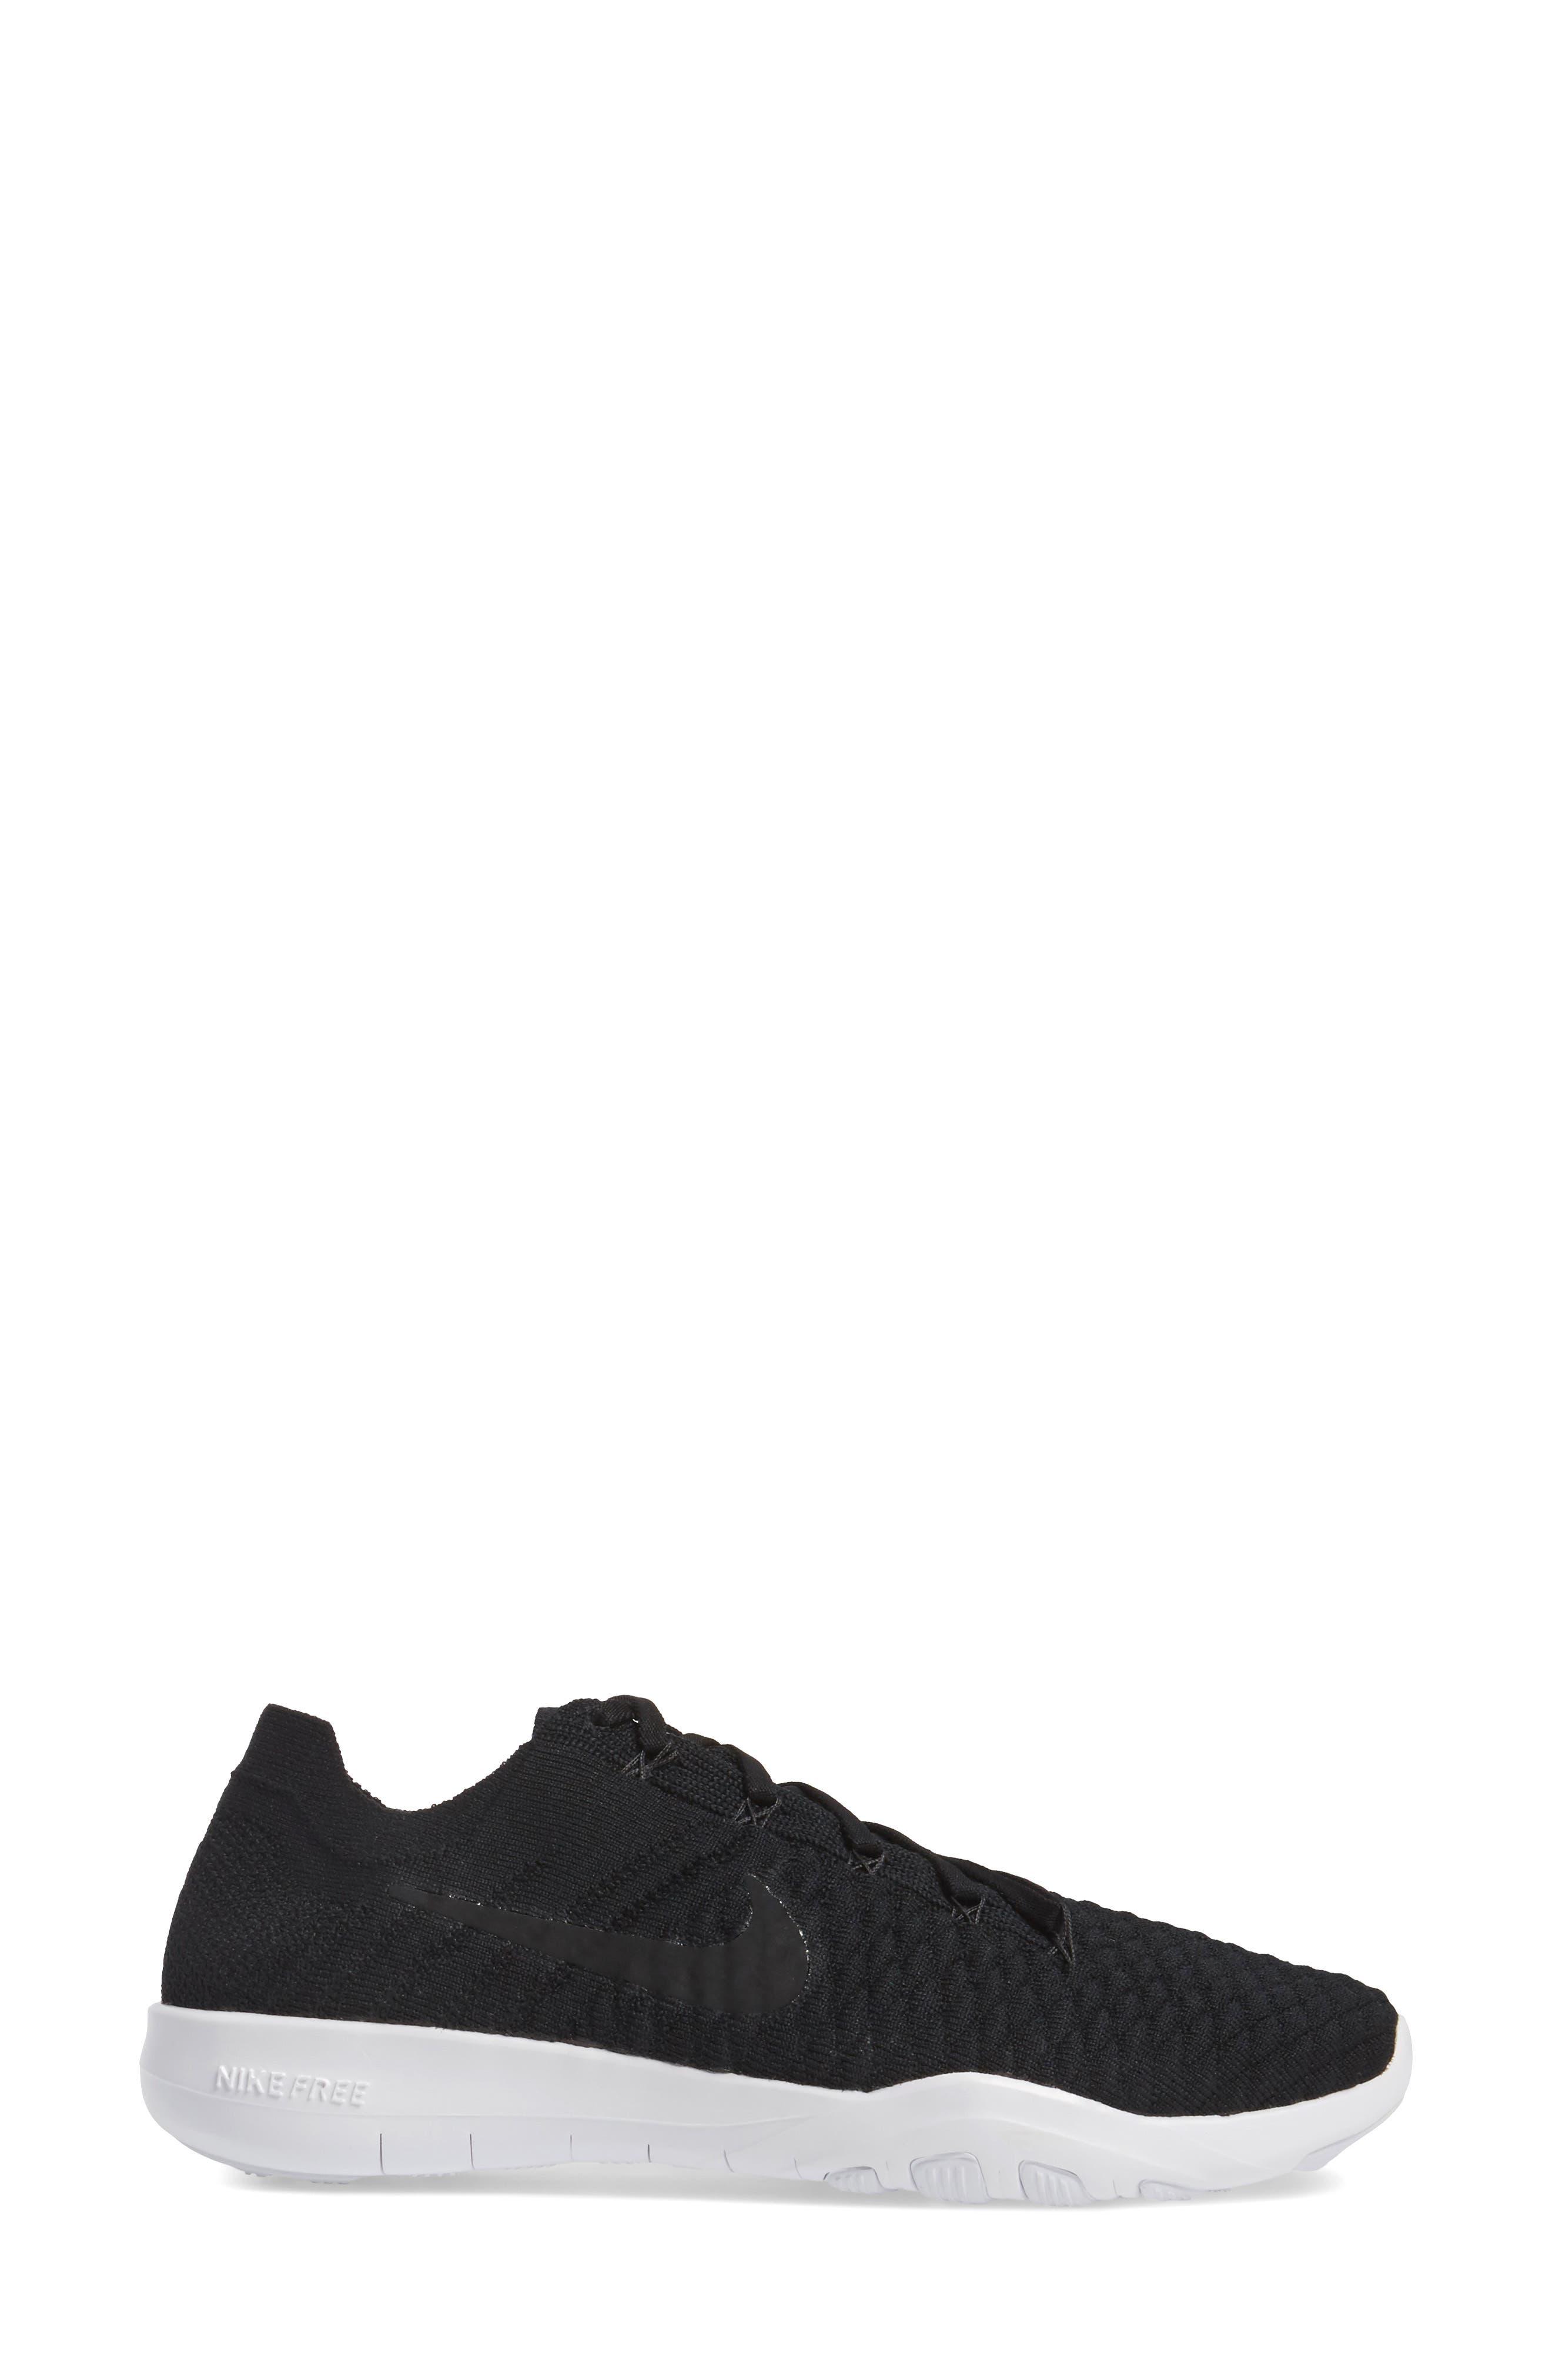 Free TR Flyknit 2 Training Shoe,                             Alternate thumbnail 3, color,                             Black/ Black/ White